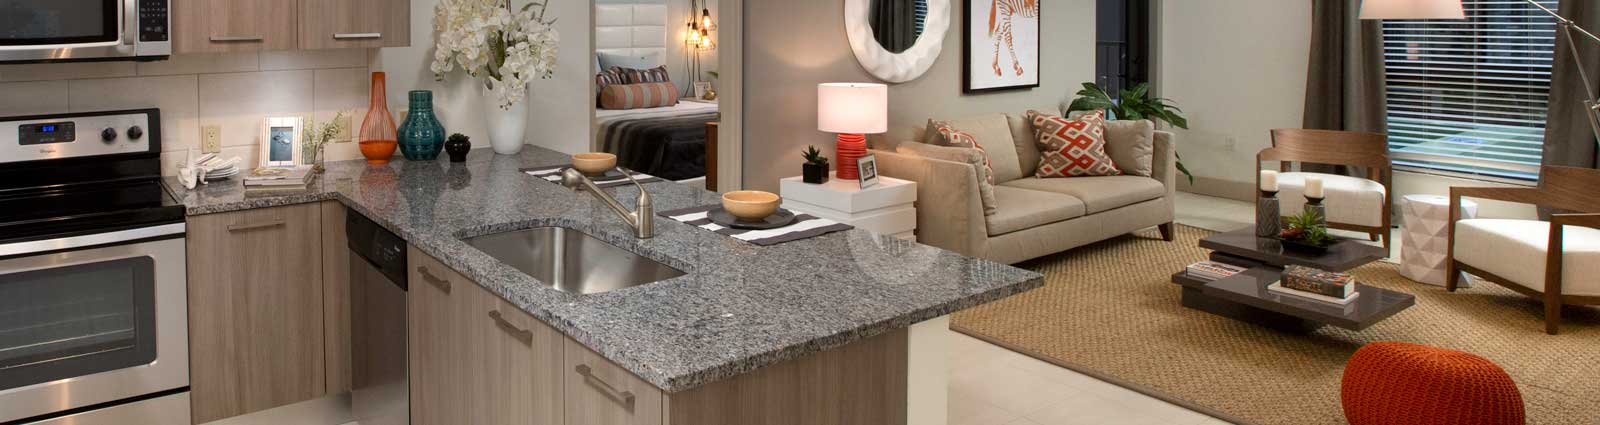 Berkshire Coral Gables community amenities